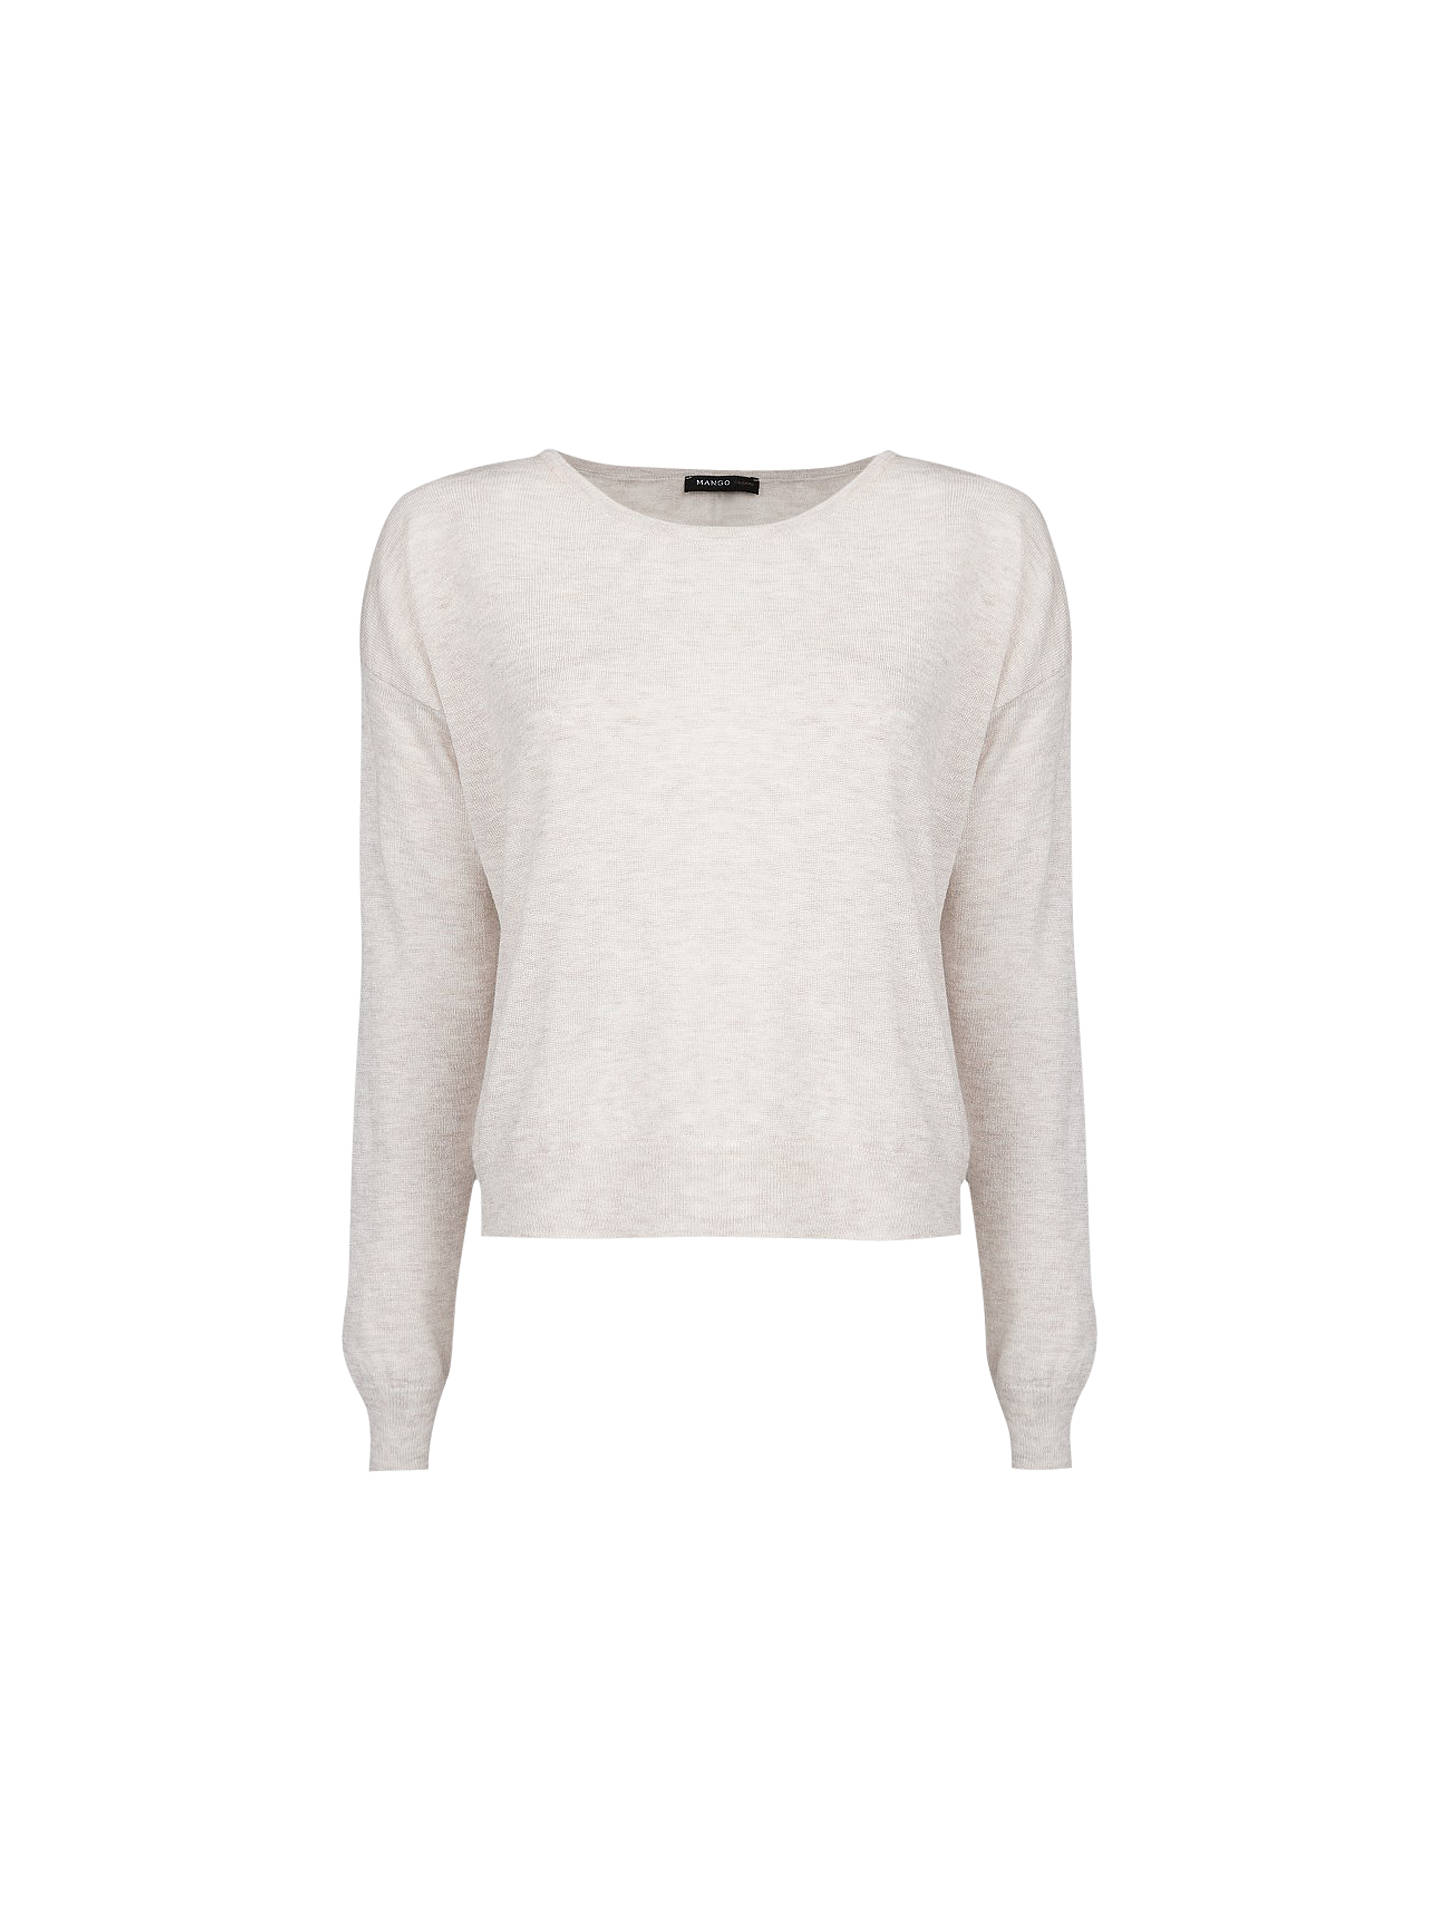 52c7ca59e966 Buy Mango Wool Blend Cropped Knit Jumper, Light Beige, S Online at  johnlewis.